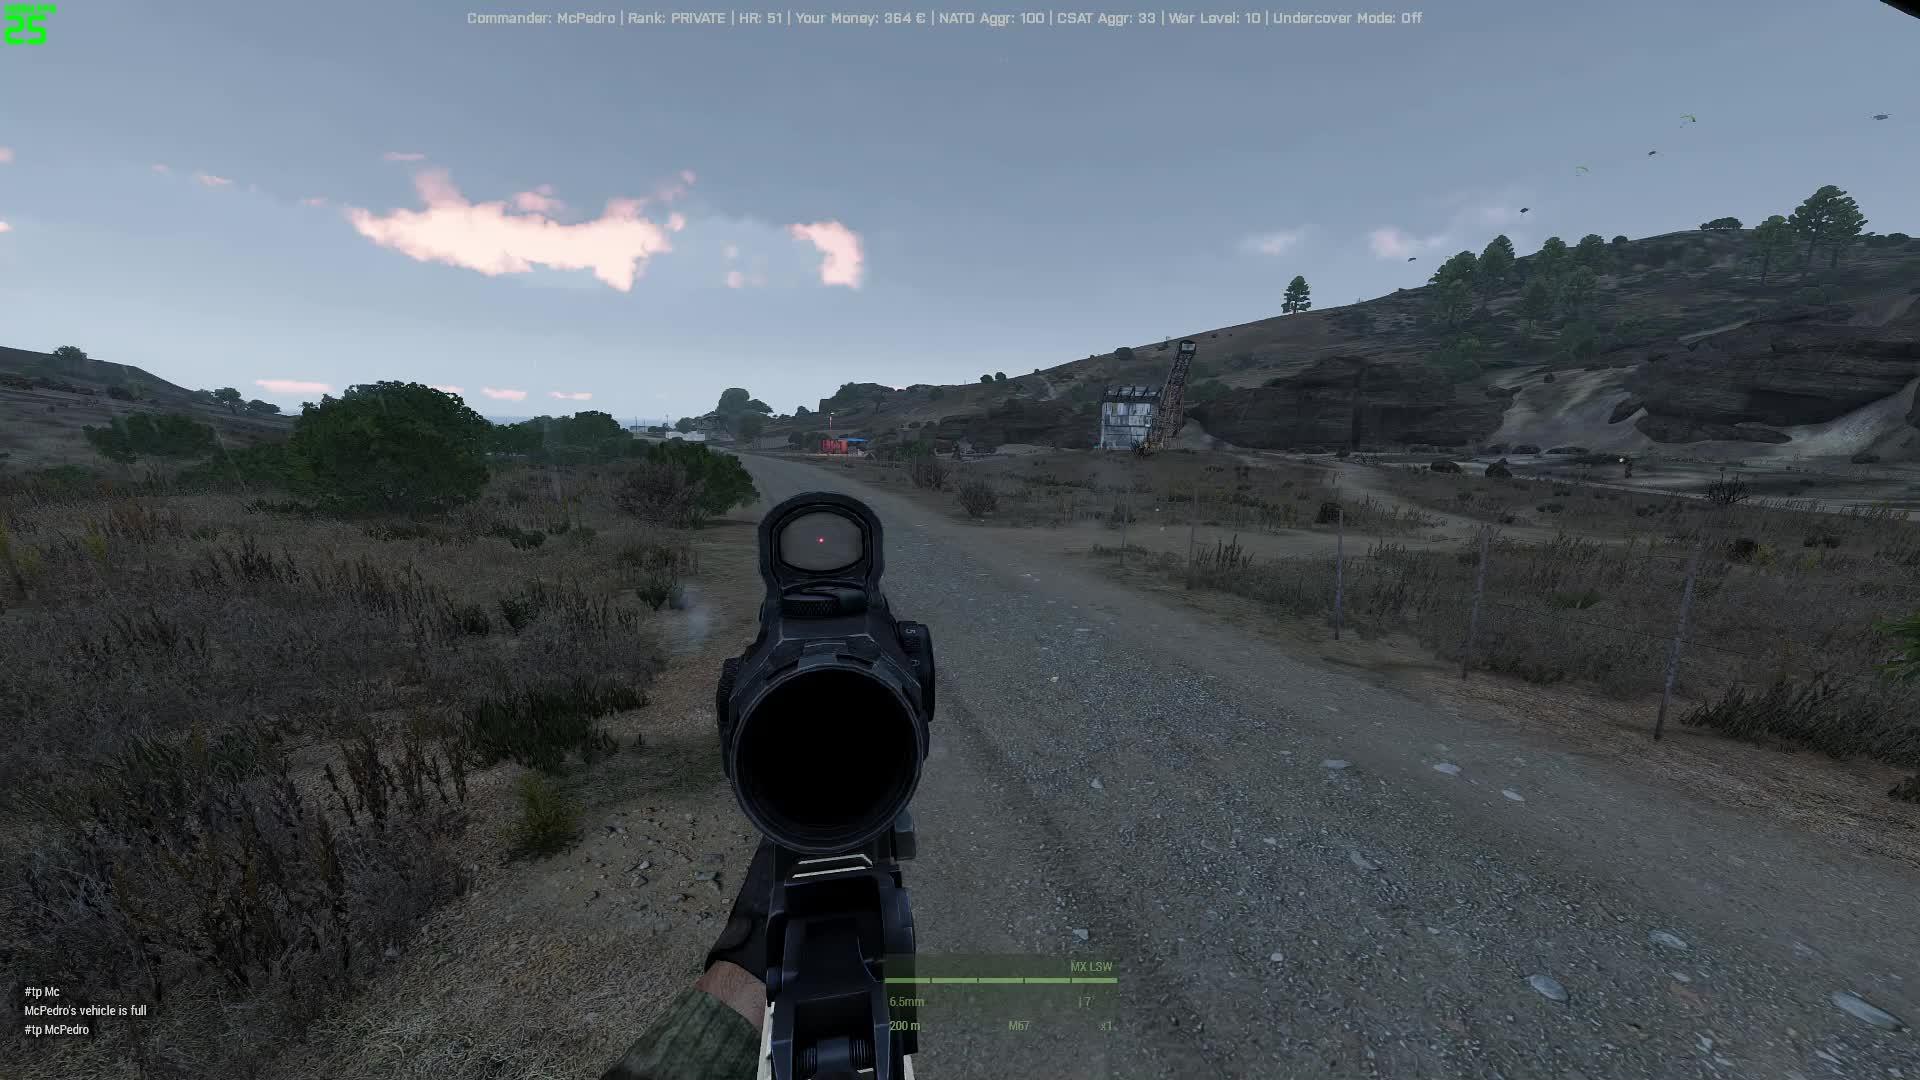 arma, arma 3, That's a missile! GIFs